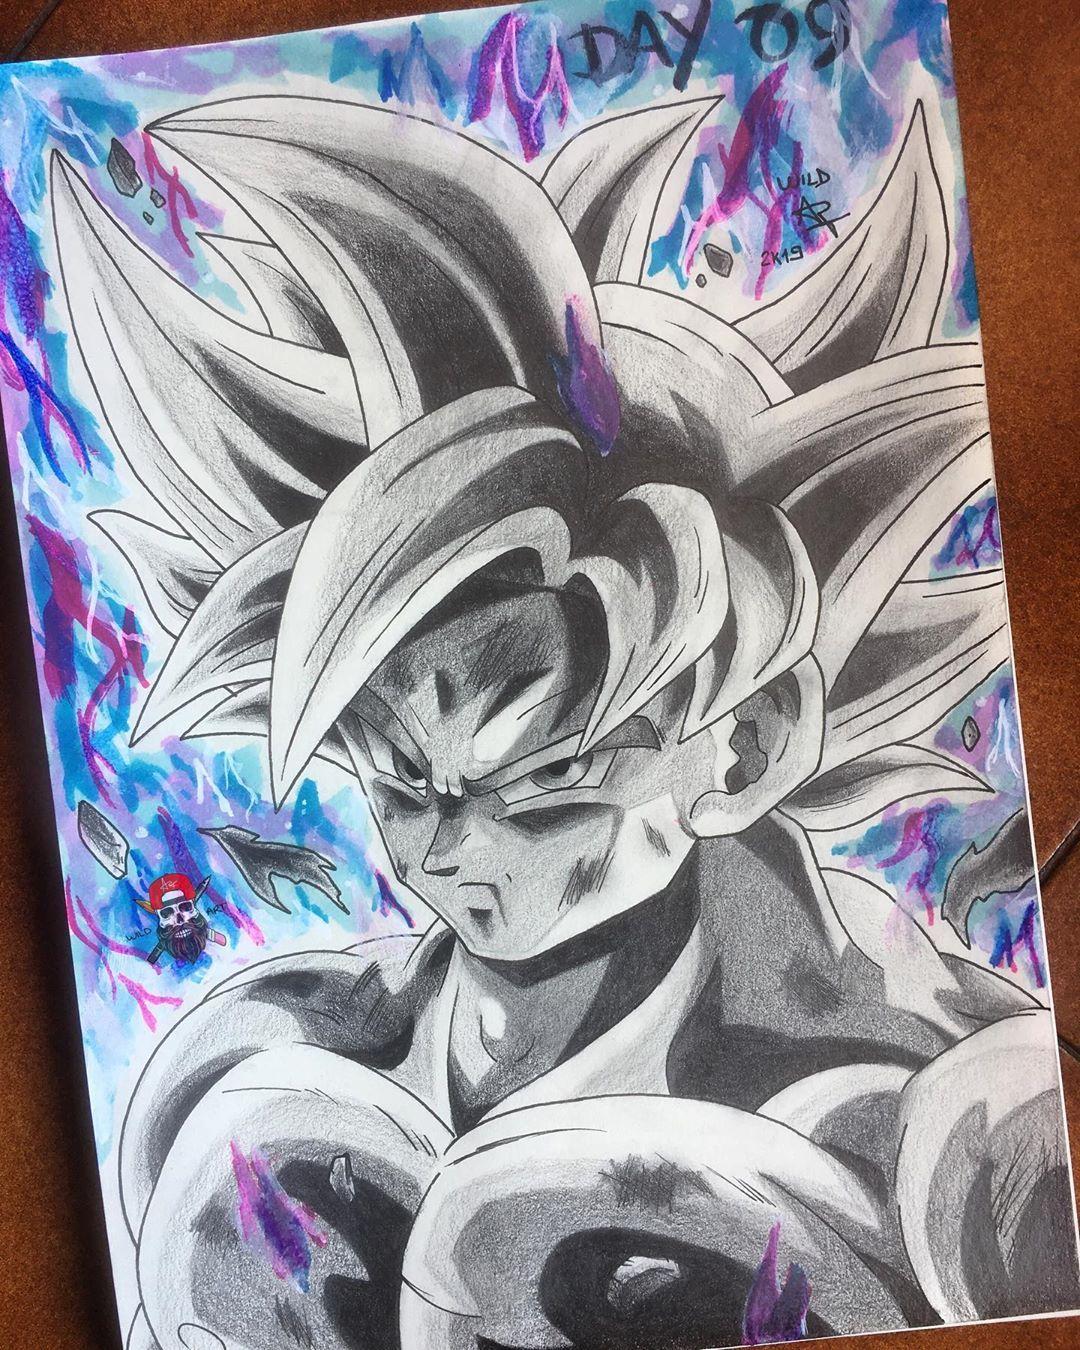 Day 09 Goku Mastered Ultra Instinct The Ninth Draw For Aprink A Kind Of Inktober Only Pencil Fine Dragon Ball Super Artwork Goku Drawing Dragon Ball Artwork